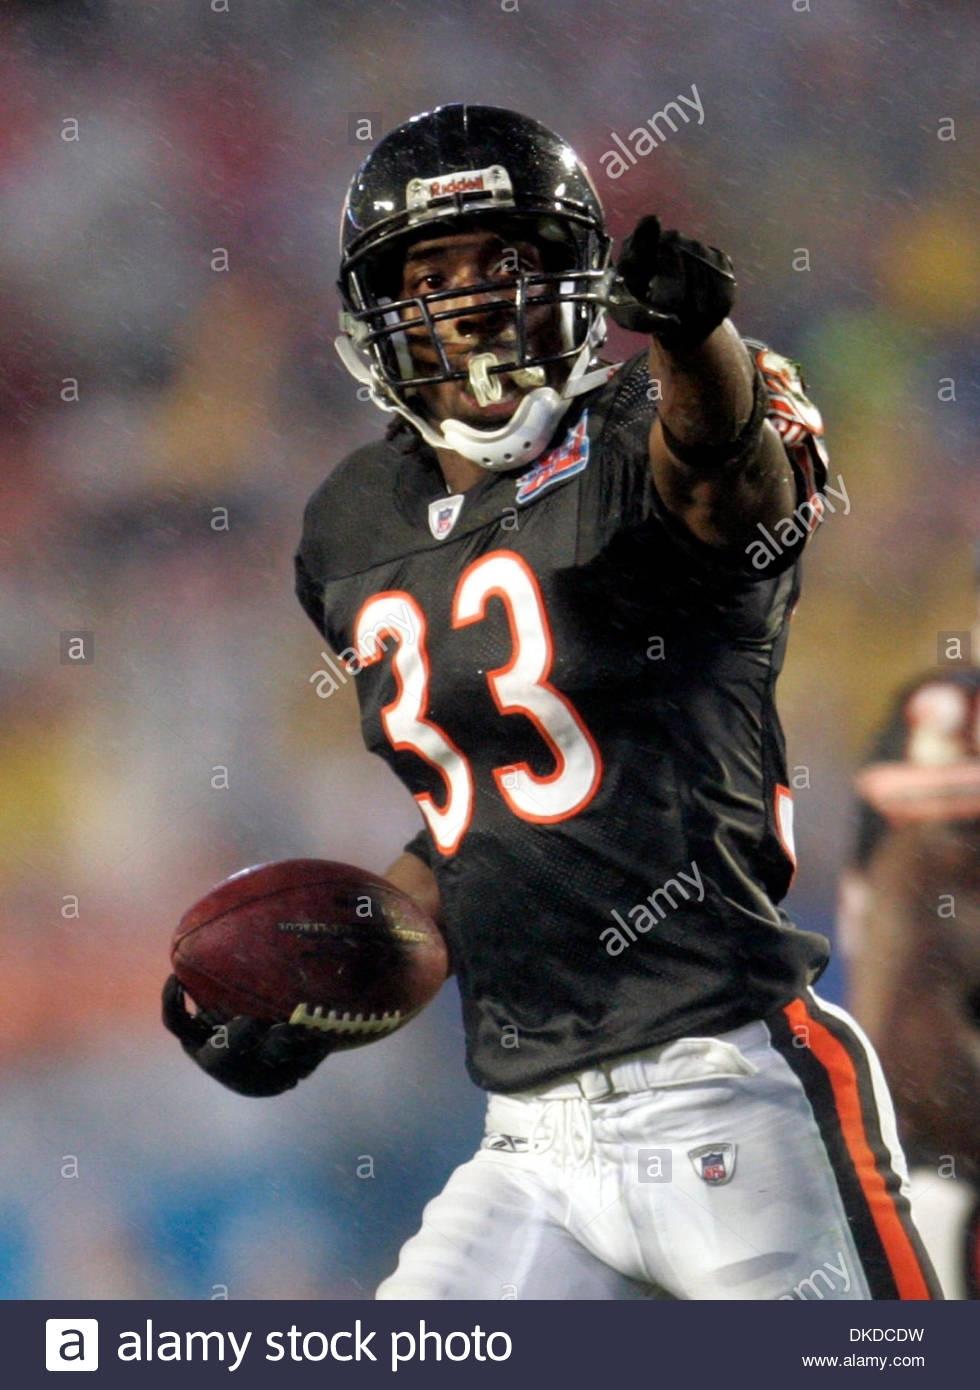 Feb 04, 2007 - Miami, Florida, Usa - Bears #33 Charles for Bears Super Bowl Miami